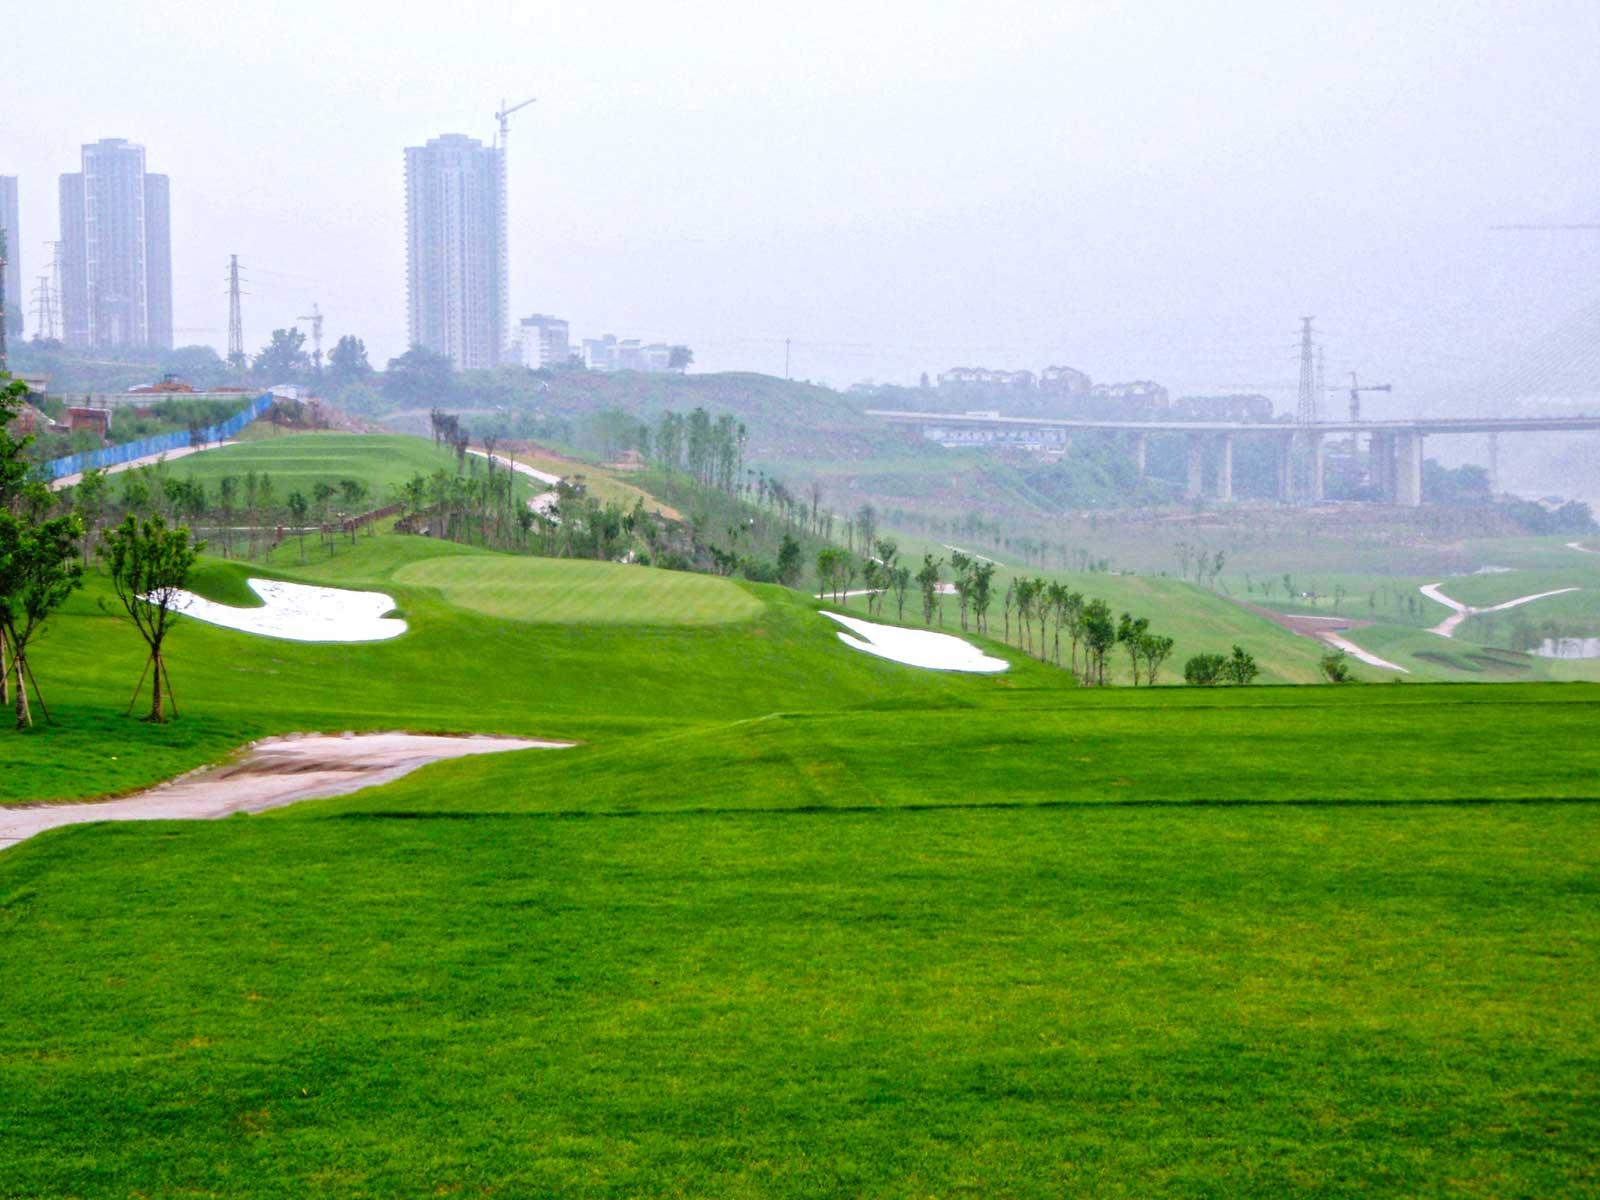 chongqing-riverview_golf-course-hole-2.jpg